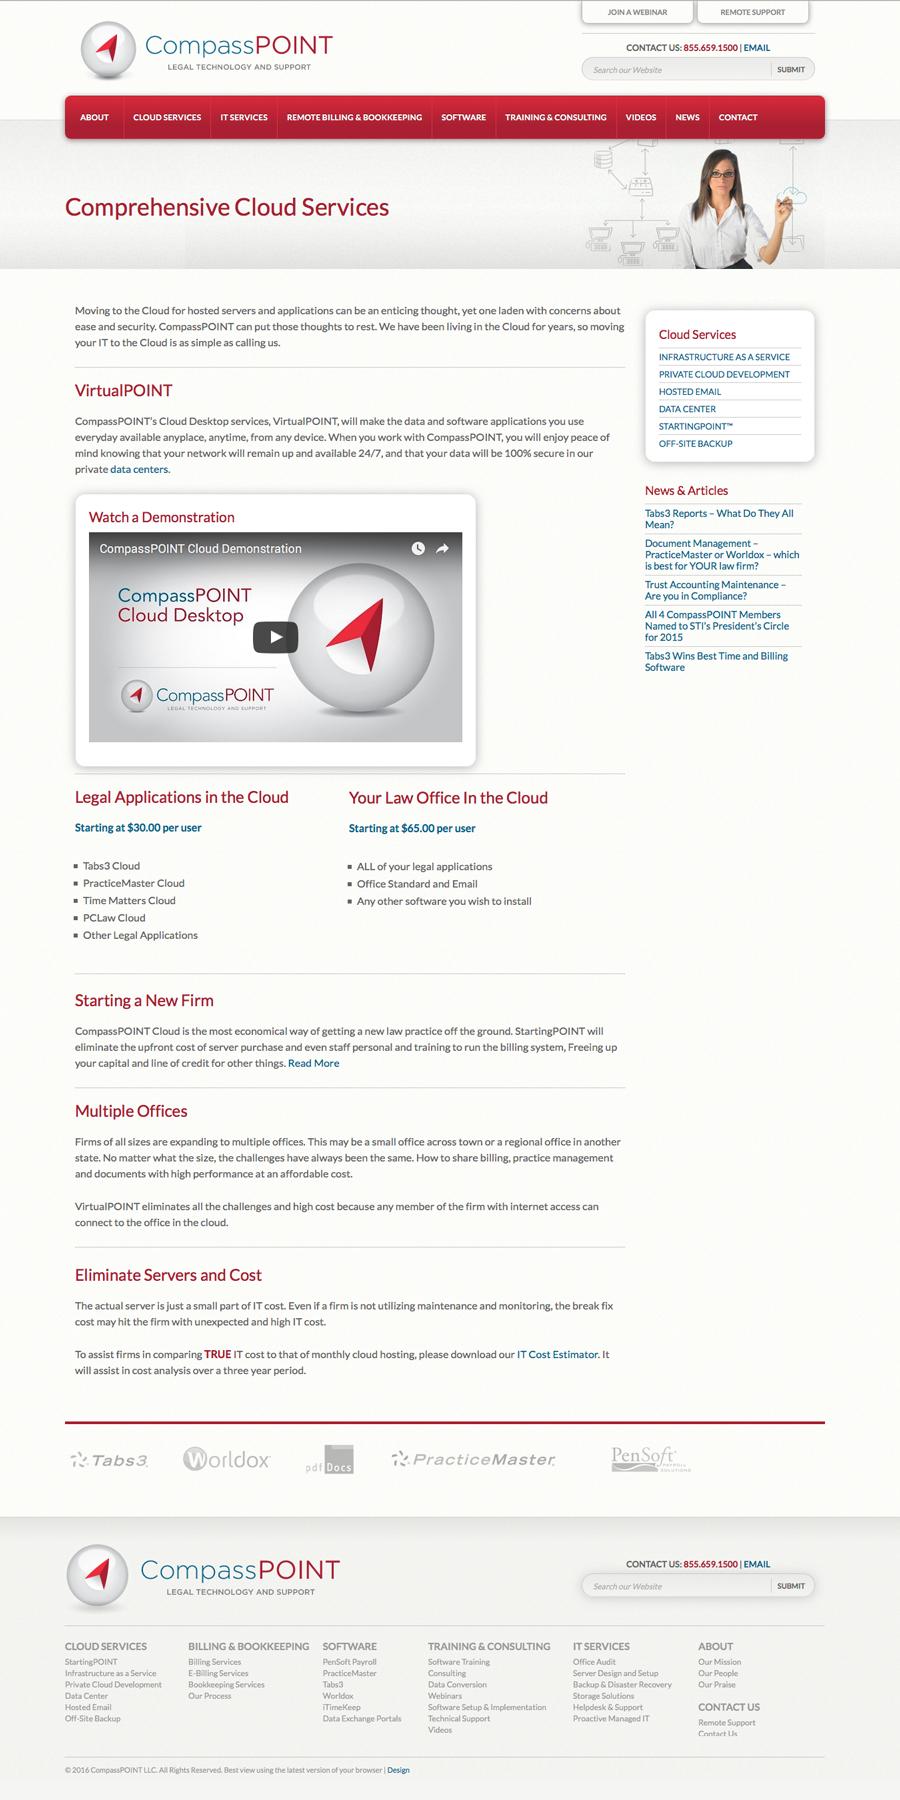 CompassPOINT Interior Page